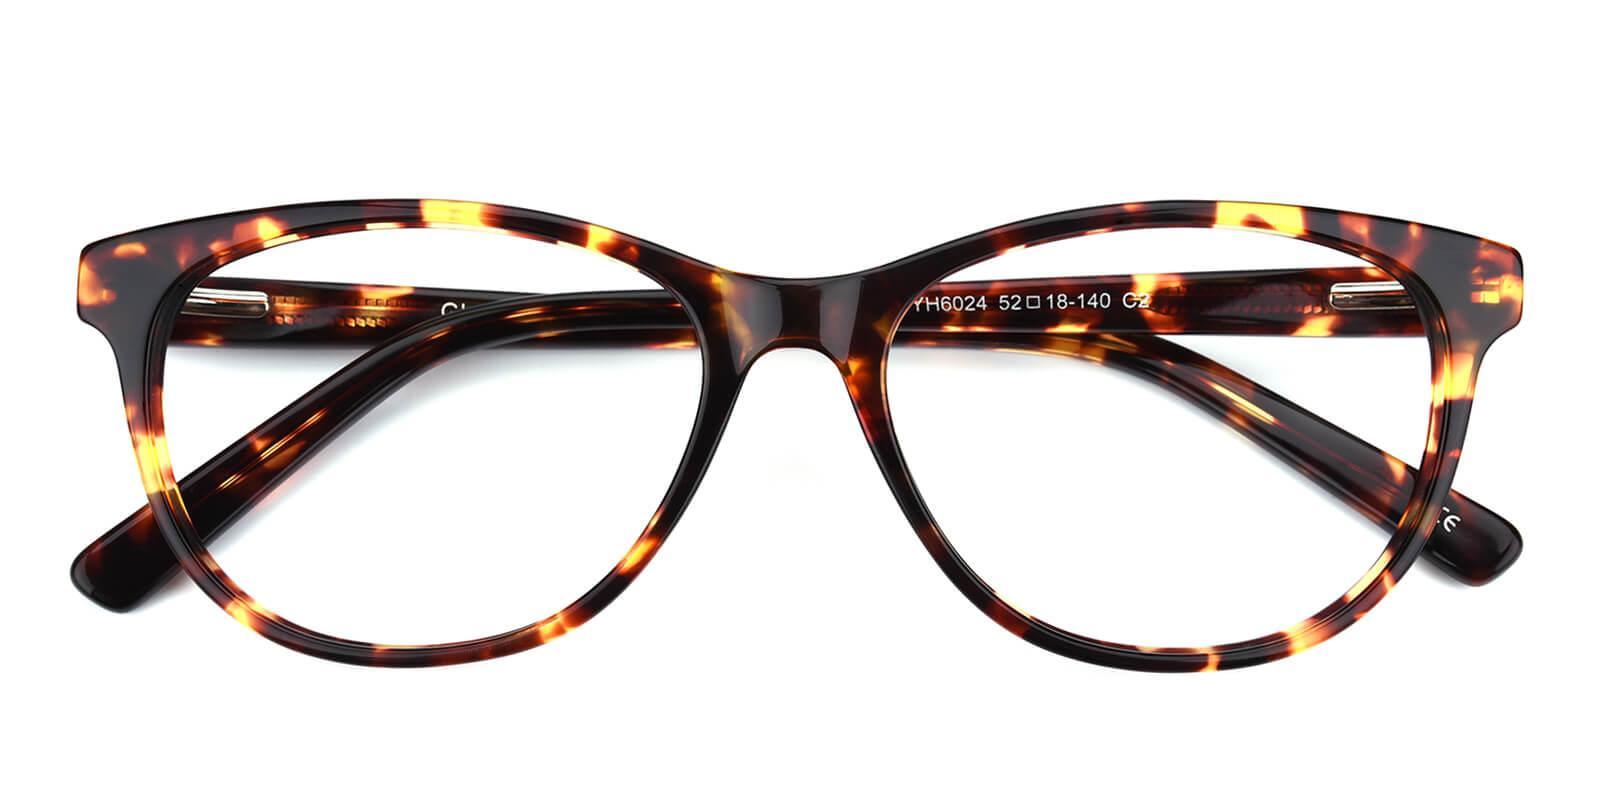 Neptunus-Pattern-Cat-Acetate-Eyeglasses-detail